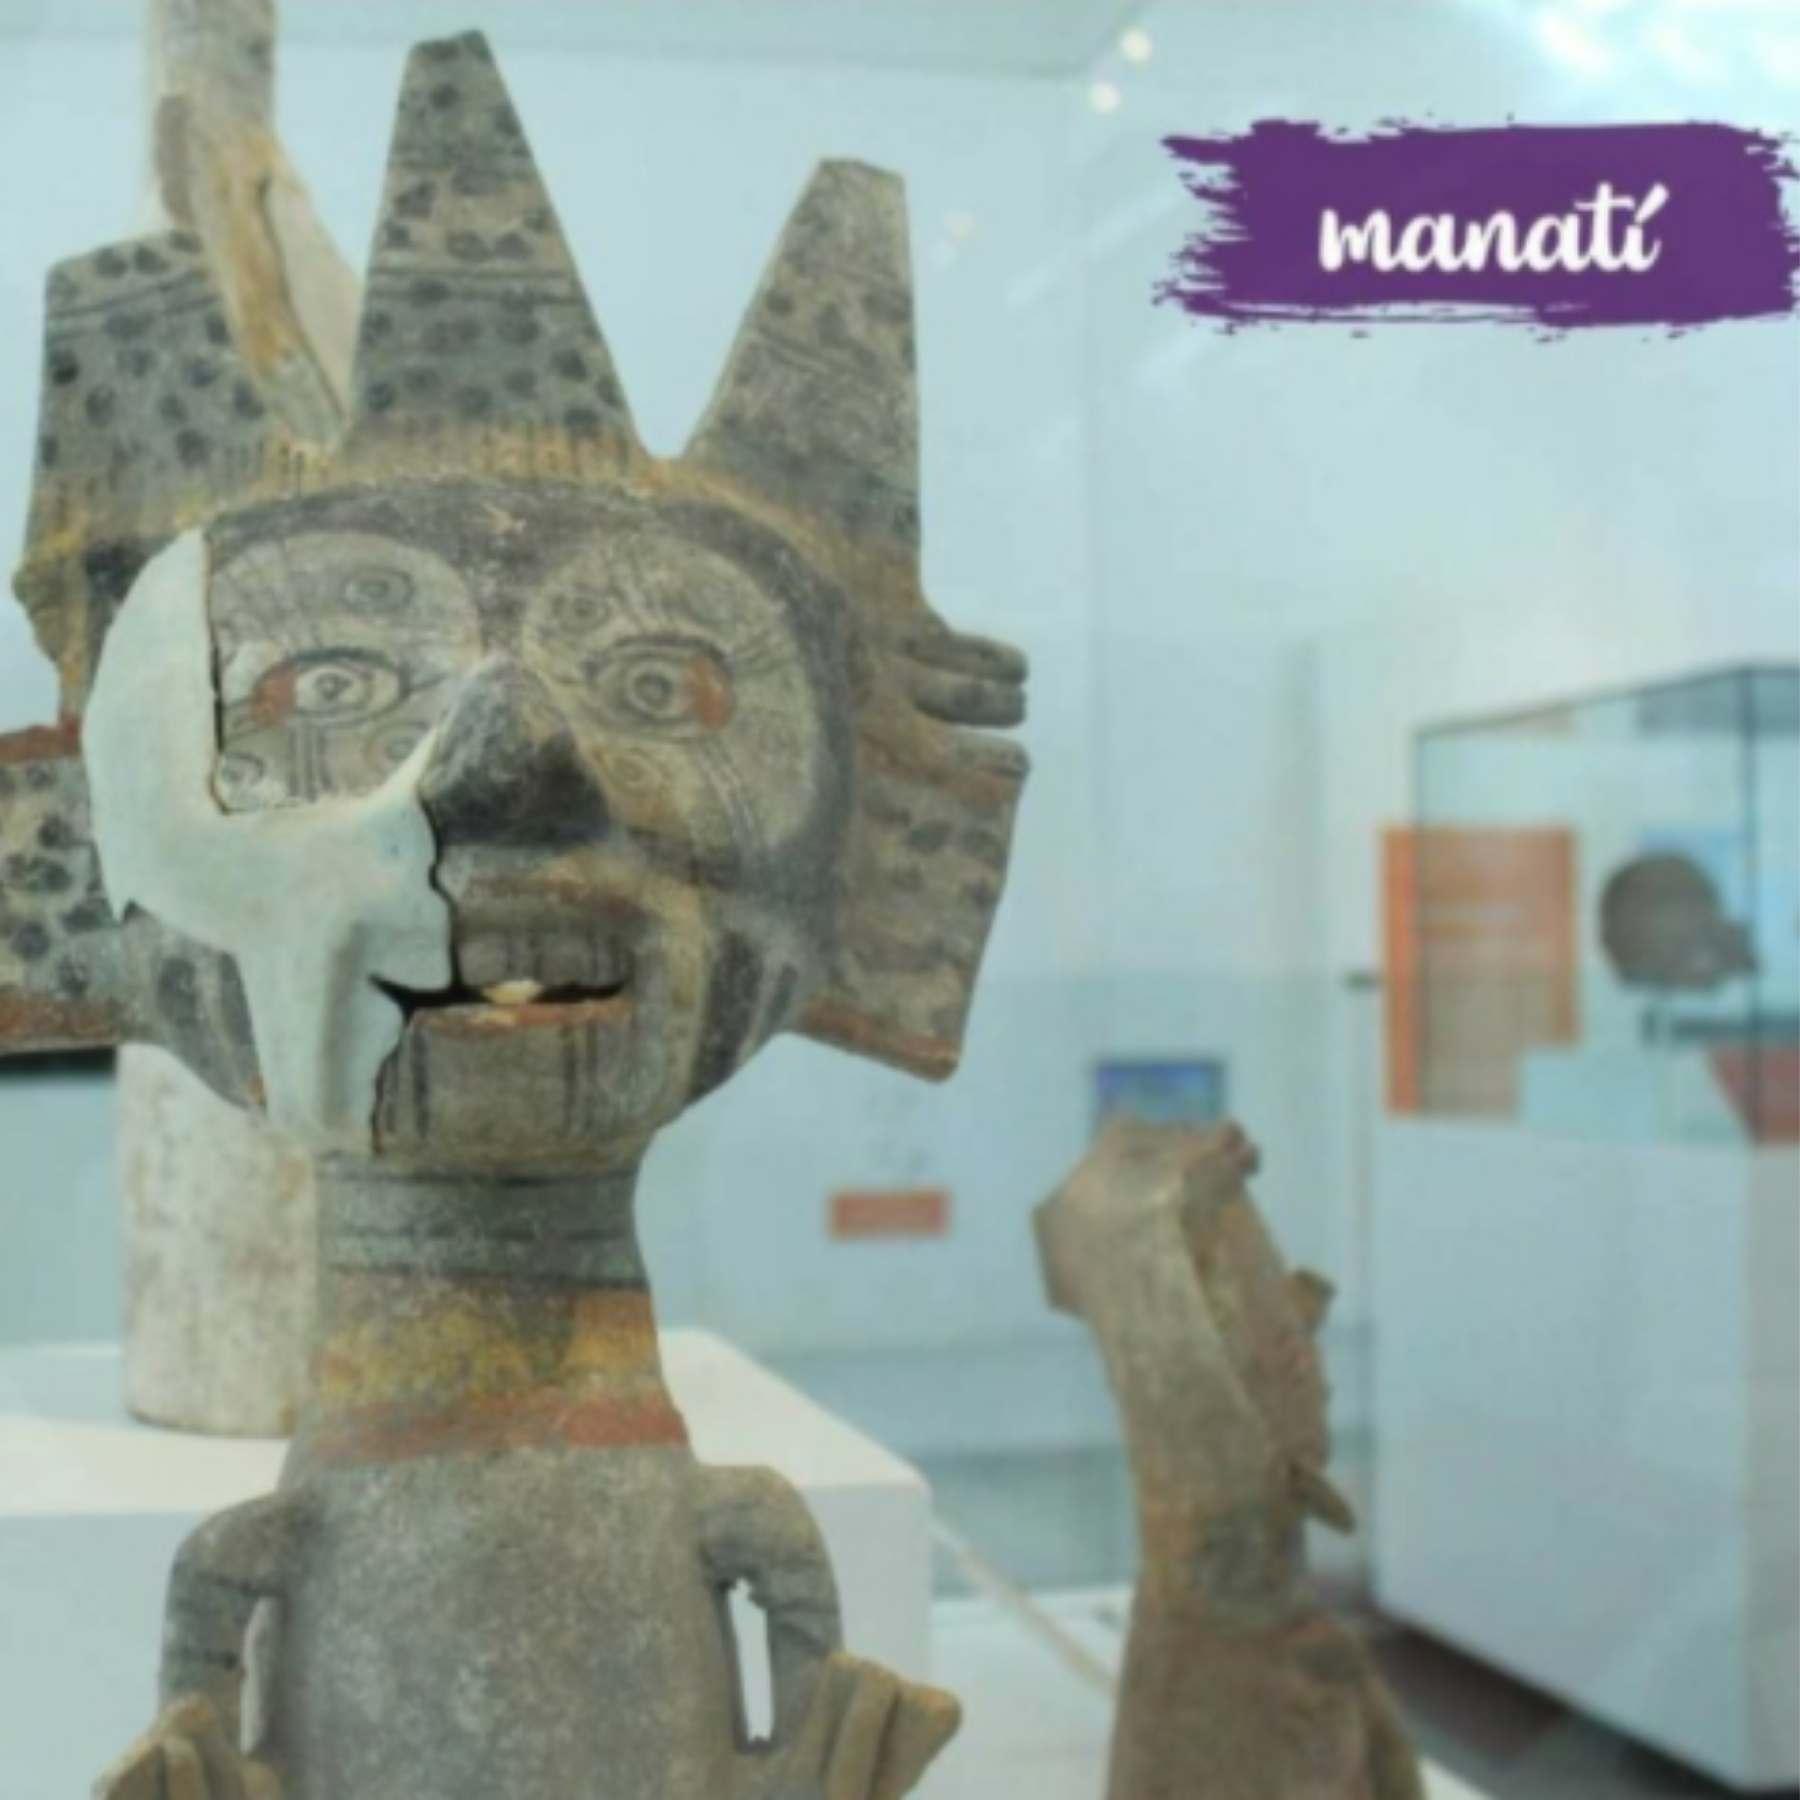 piezas arqueológicas Tehuacán INAH